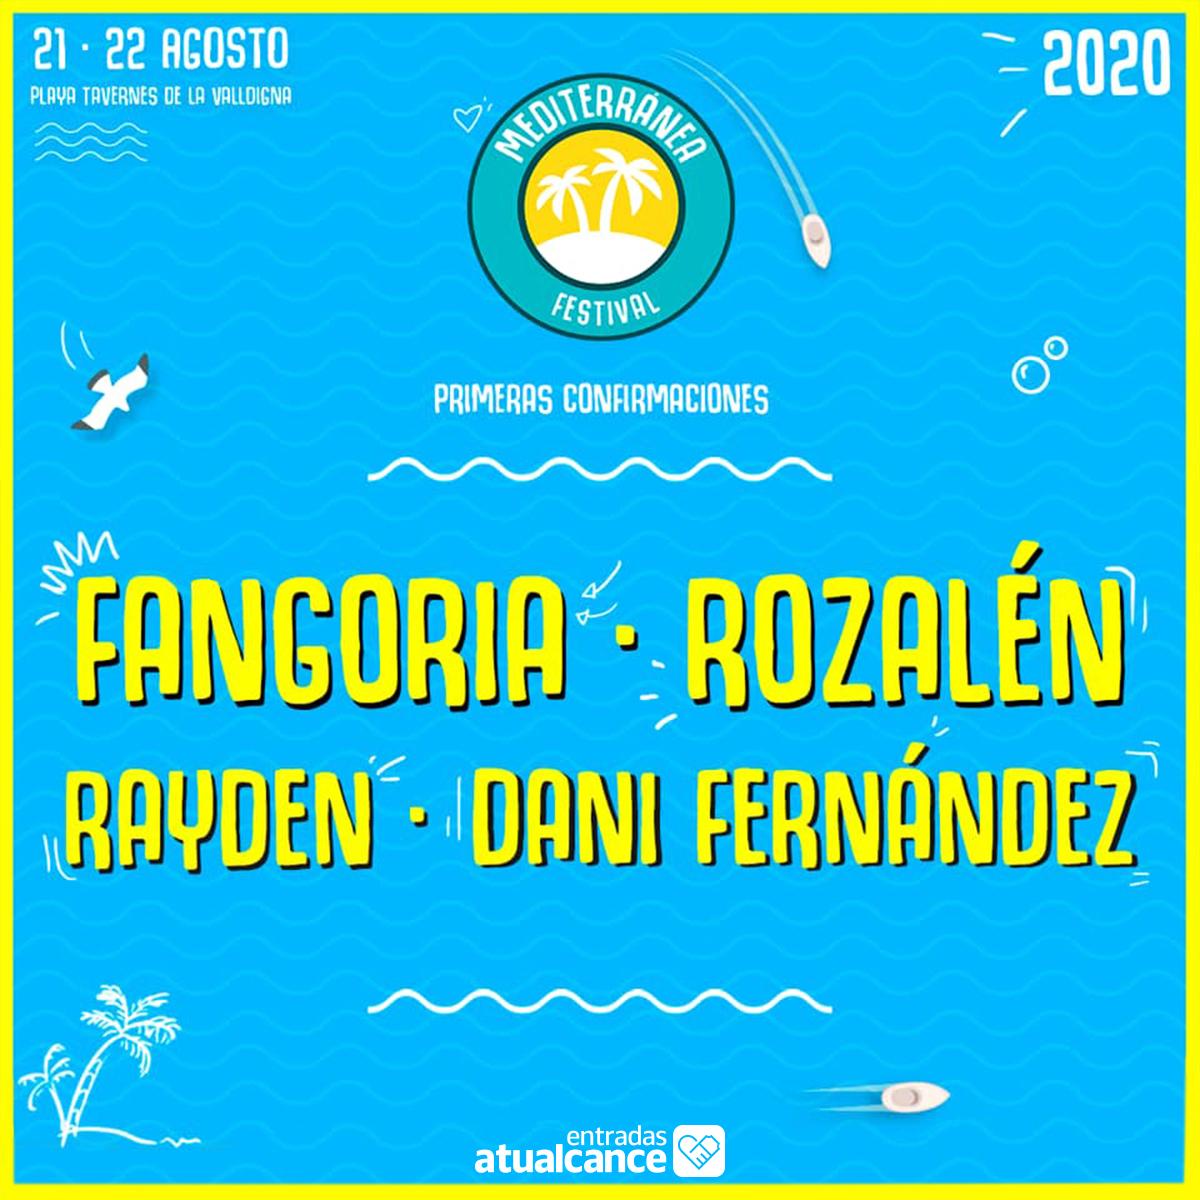 mediterranea-festival-2020-5e16026ab6856.jpeg